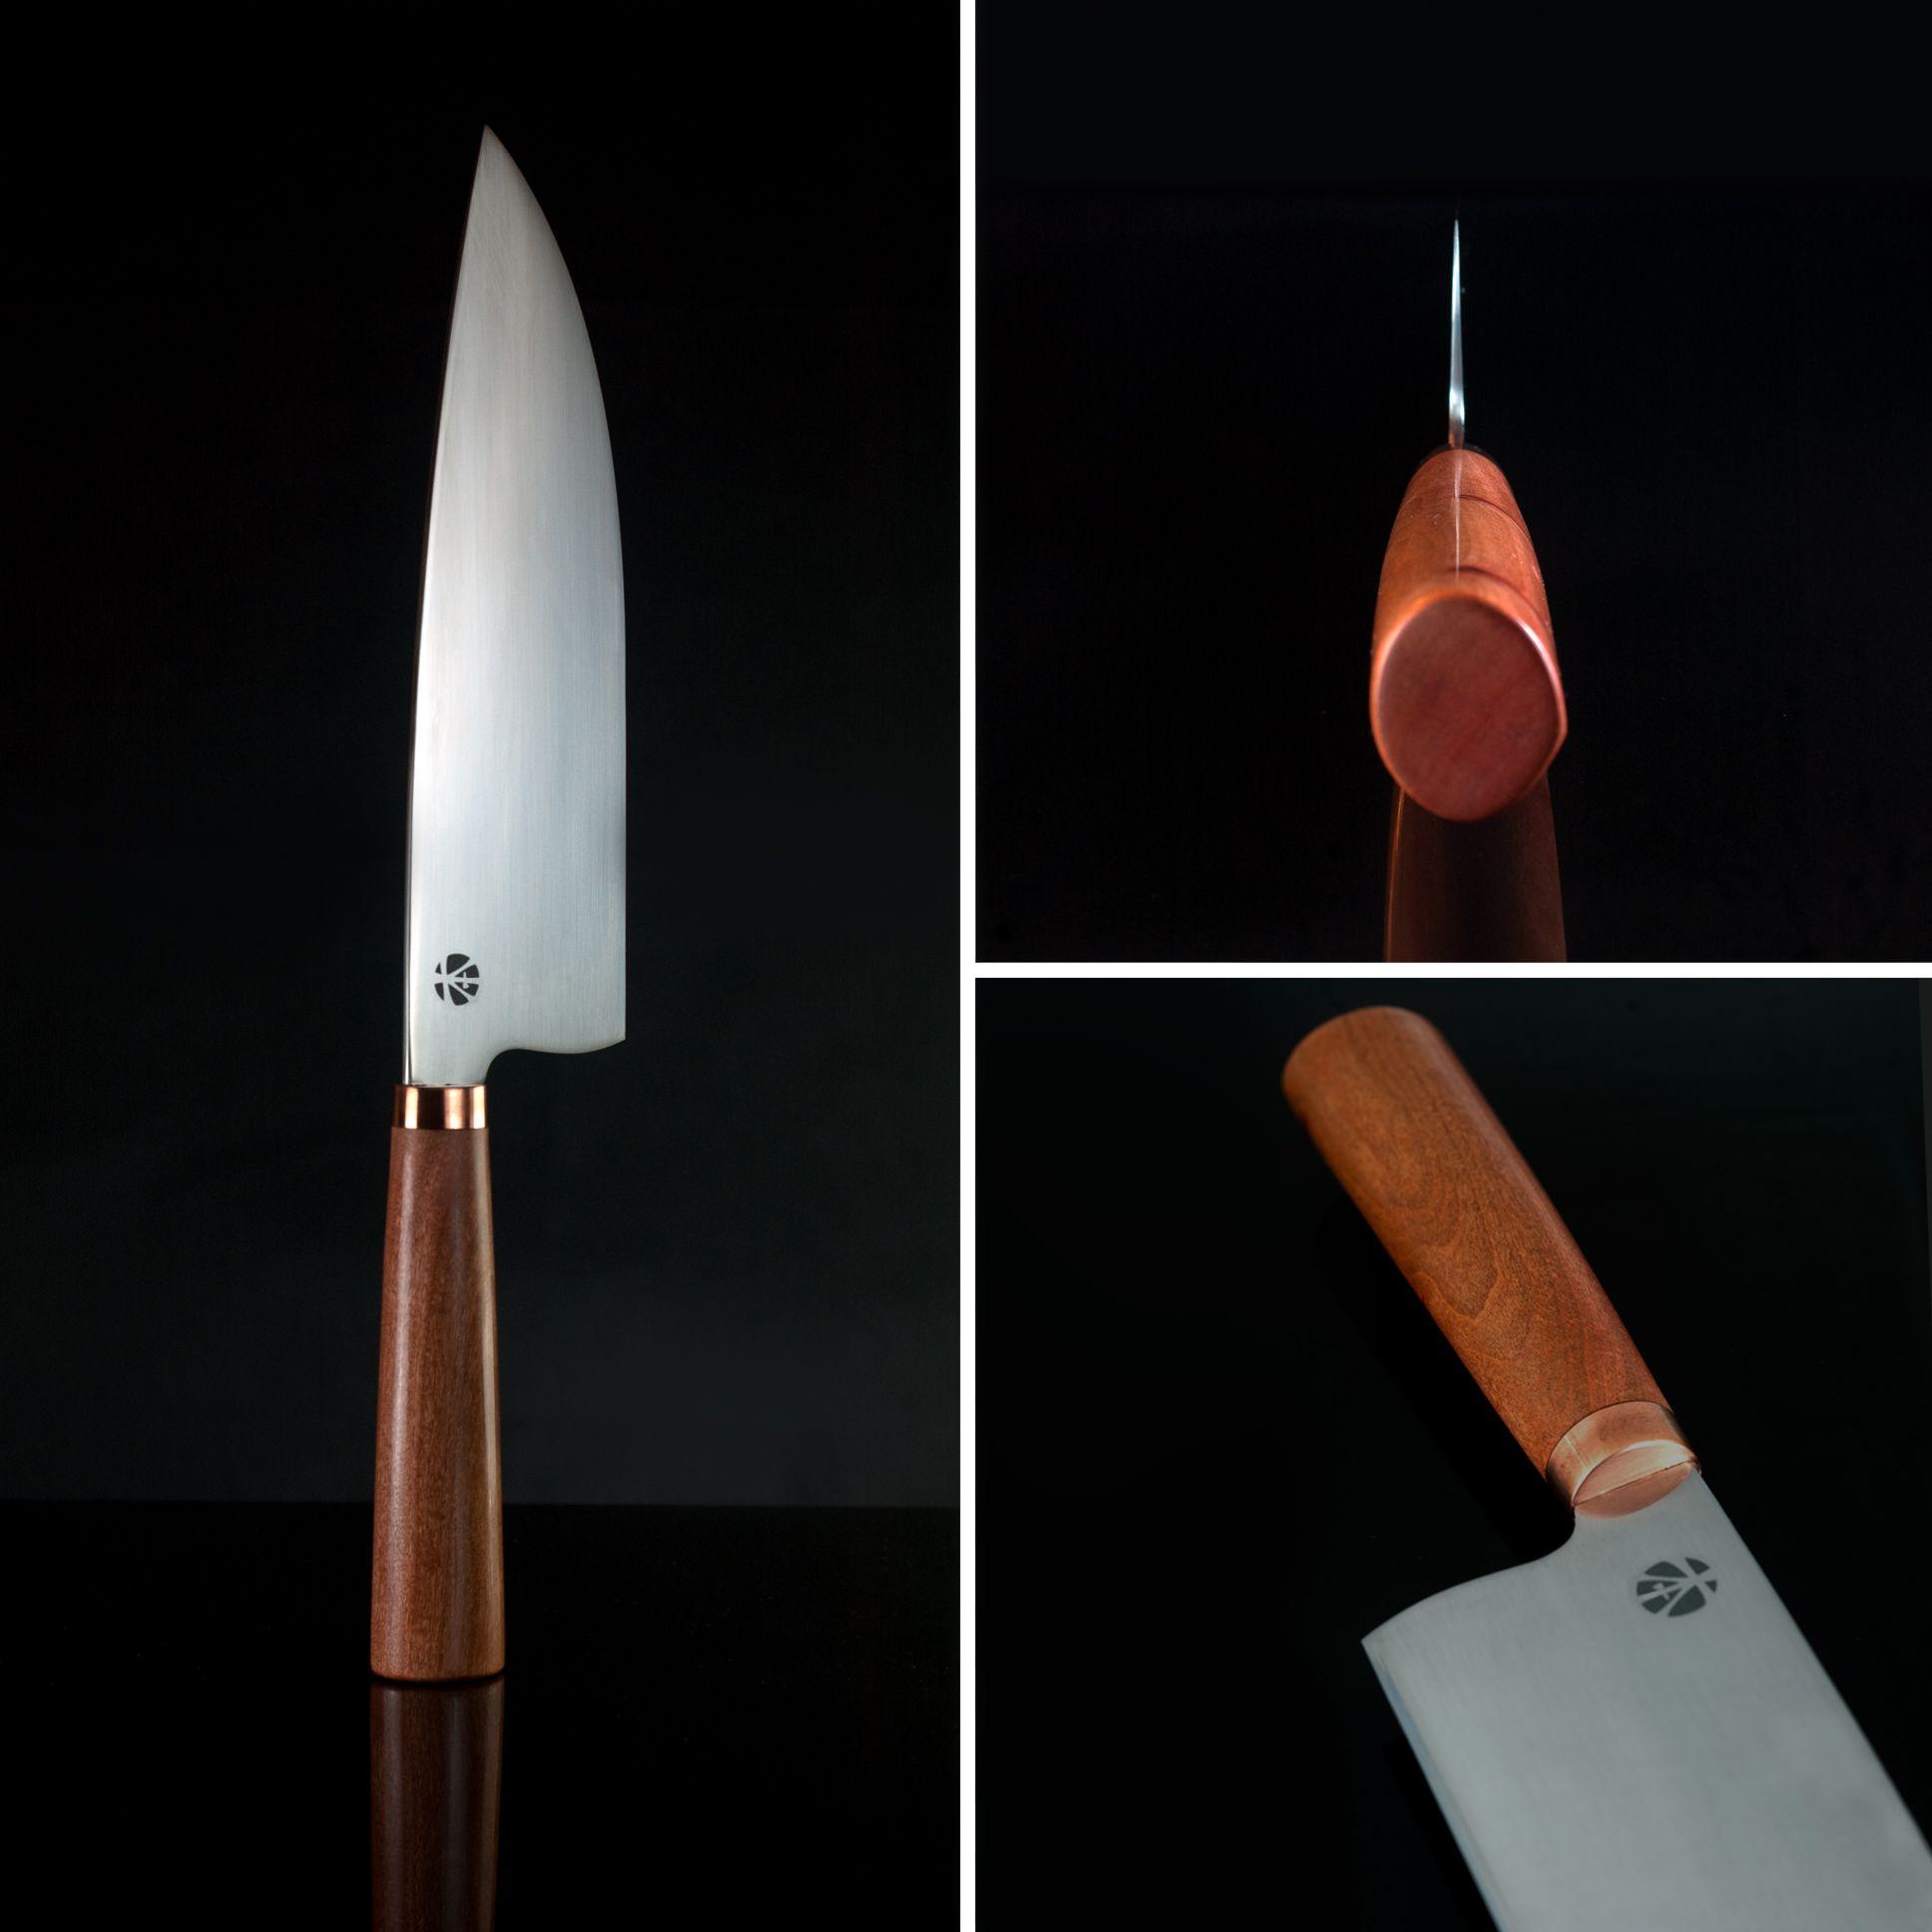 Custom 10 Chef Knife In Bohler N690 Stainless Steel The Japanese D Shaped Left Hand Specific Handle Feat Knife Shapes Kitchen Knives Japanese Kitchen Knives